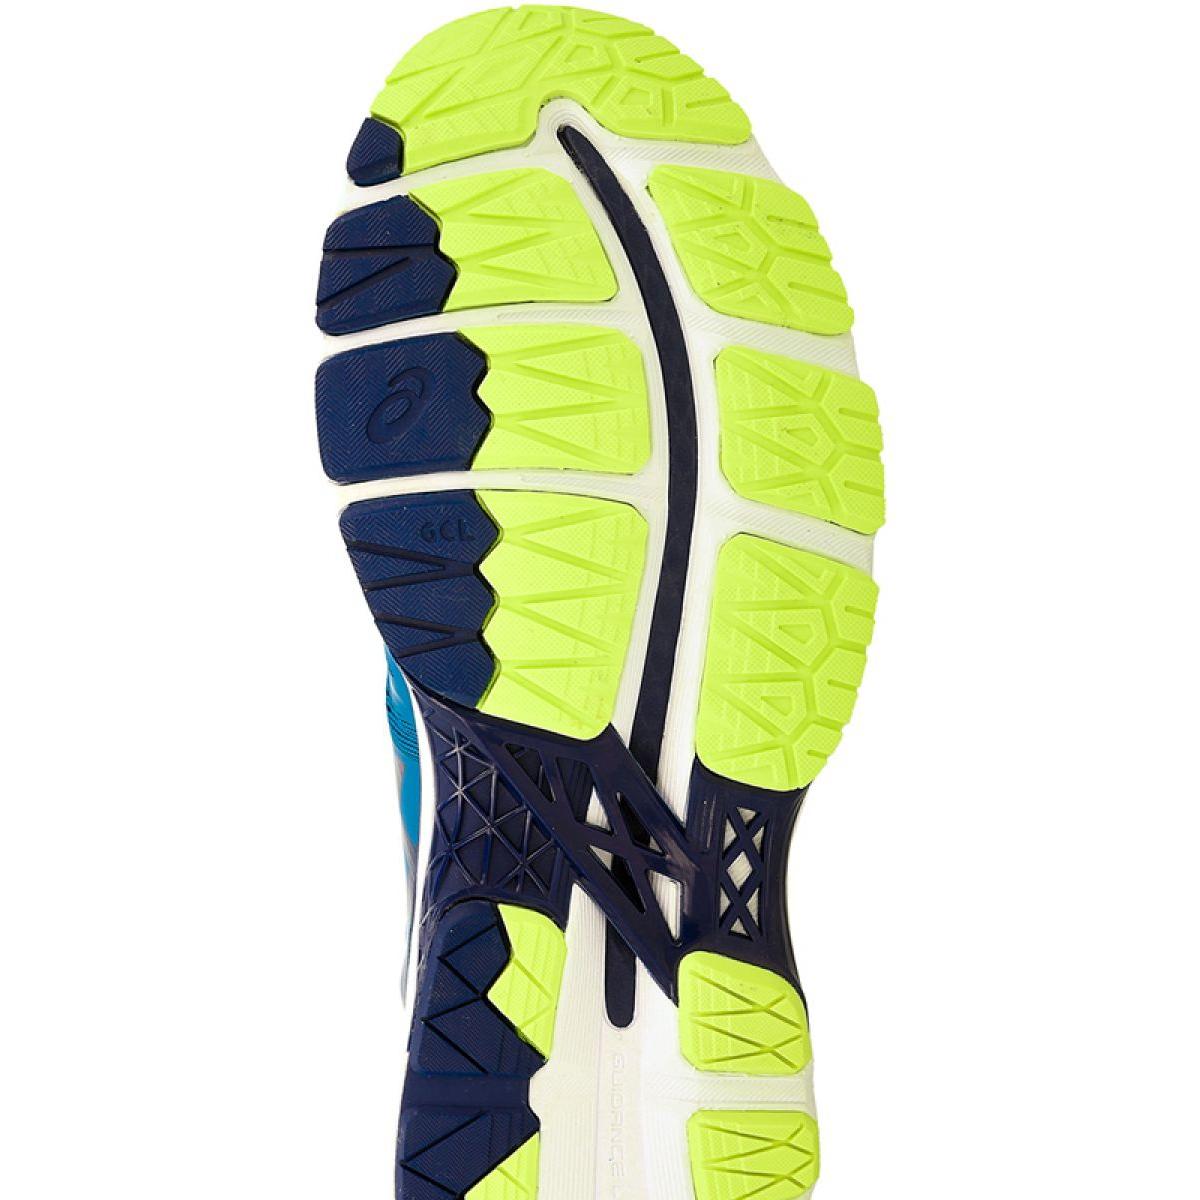 super popular 09055 ed585 Zapatillas de correr Asics Gel-KAYANO 23 M T646N-4907